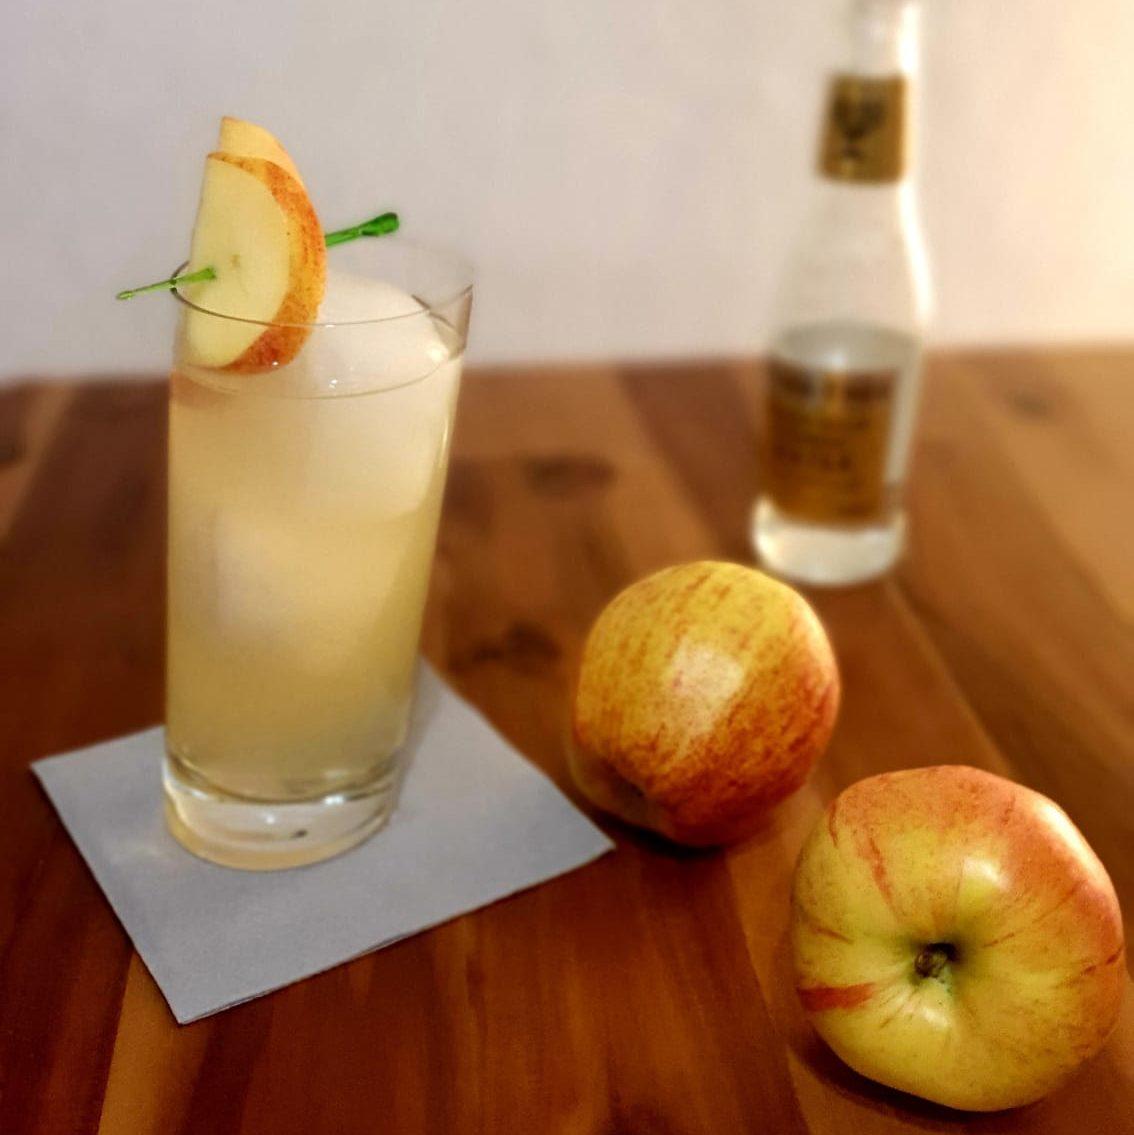 Apfel Gin Tonic eine echte Alternative zum Gin Tonic